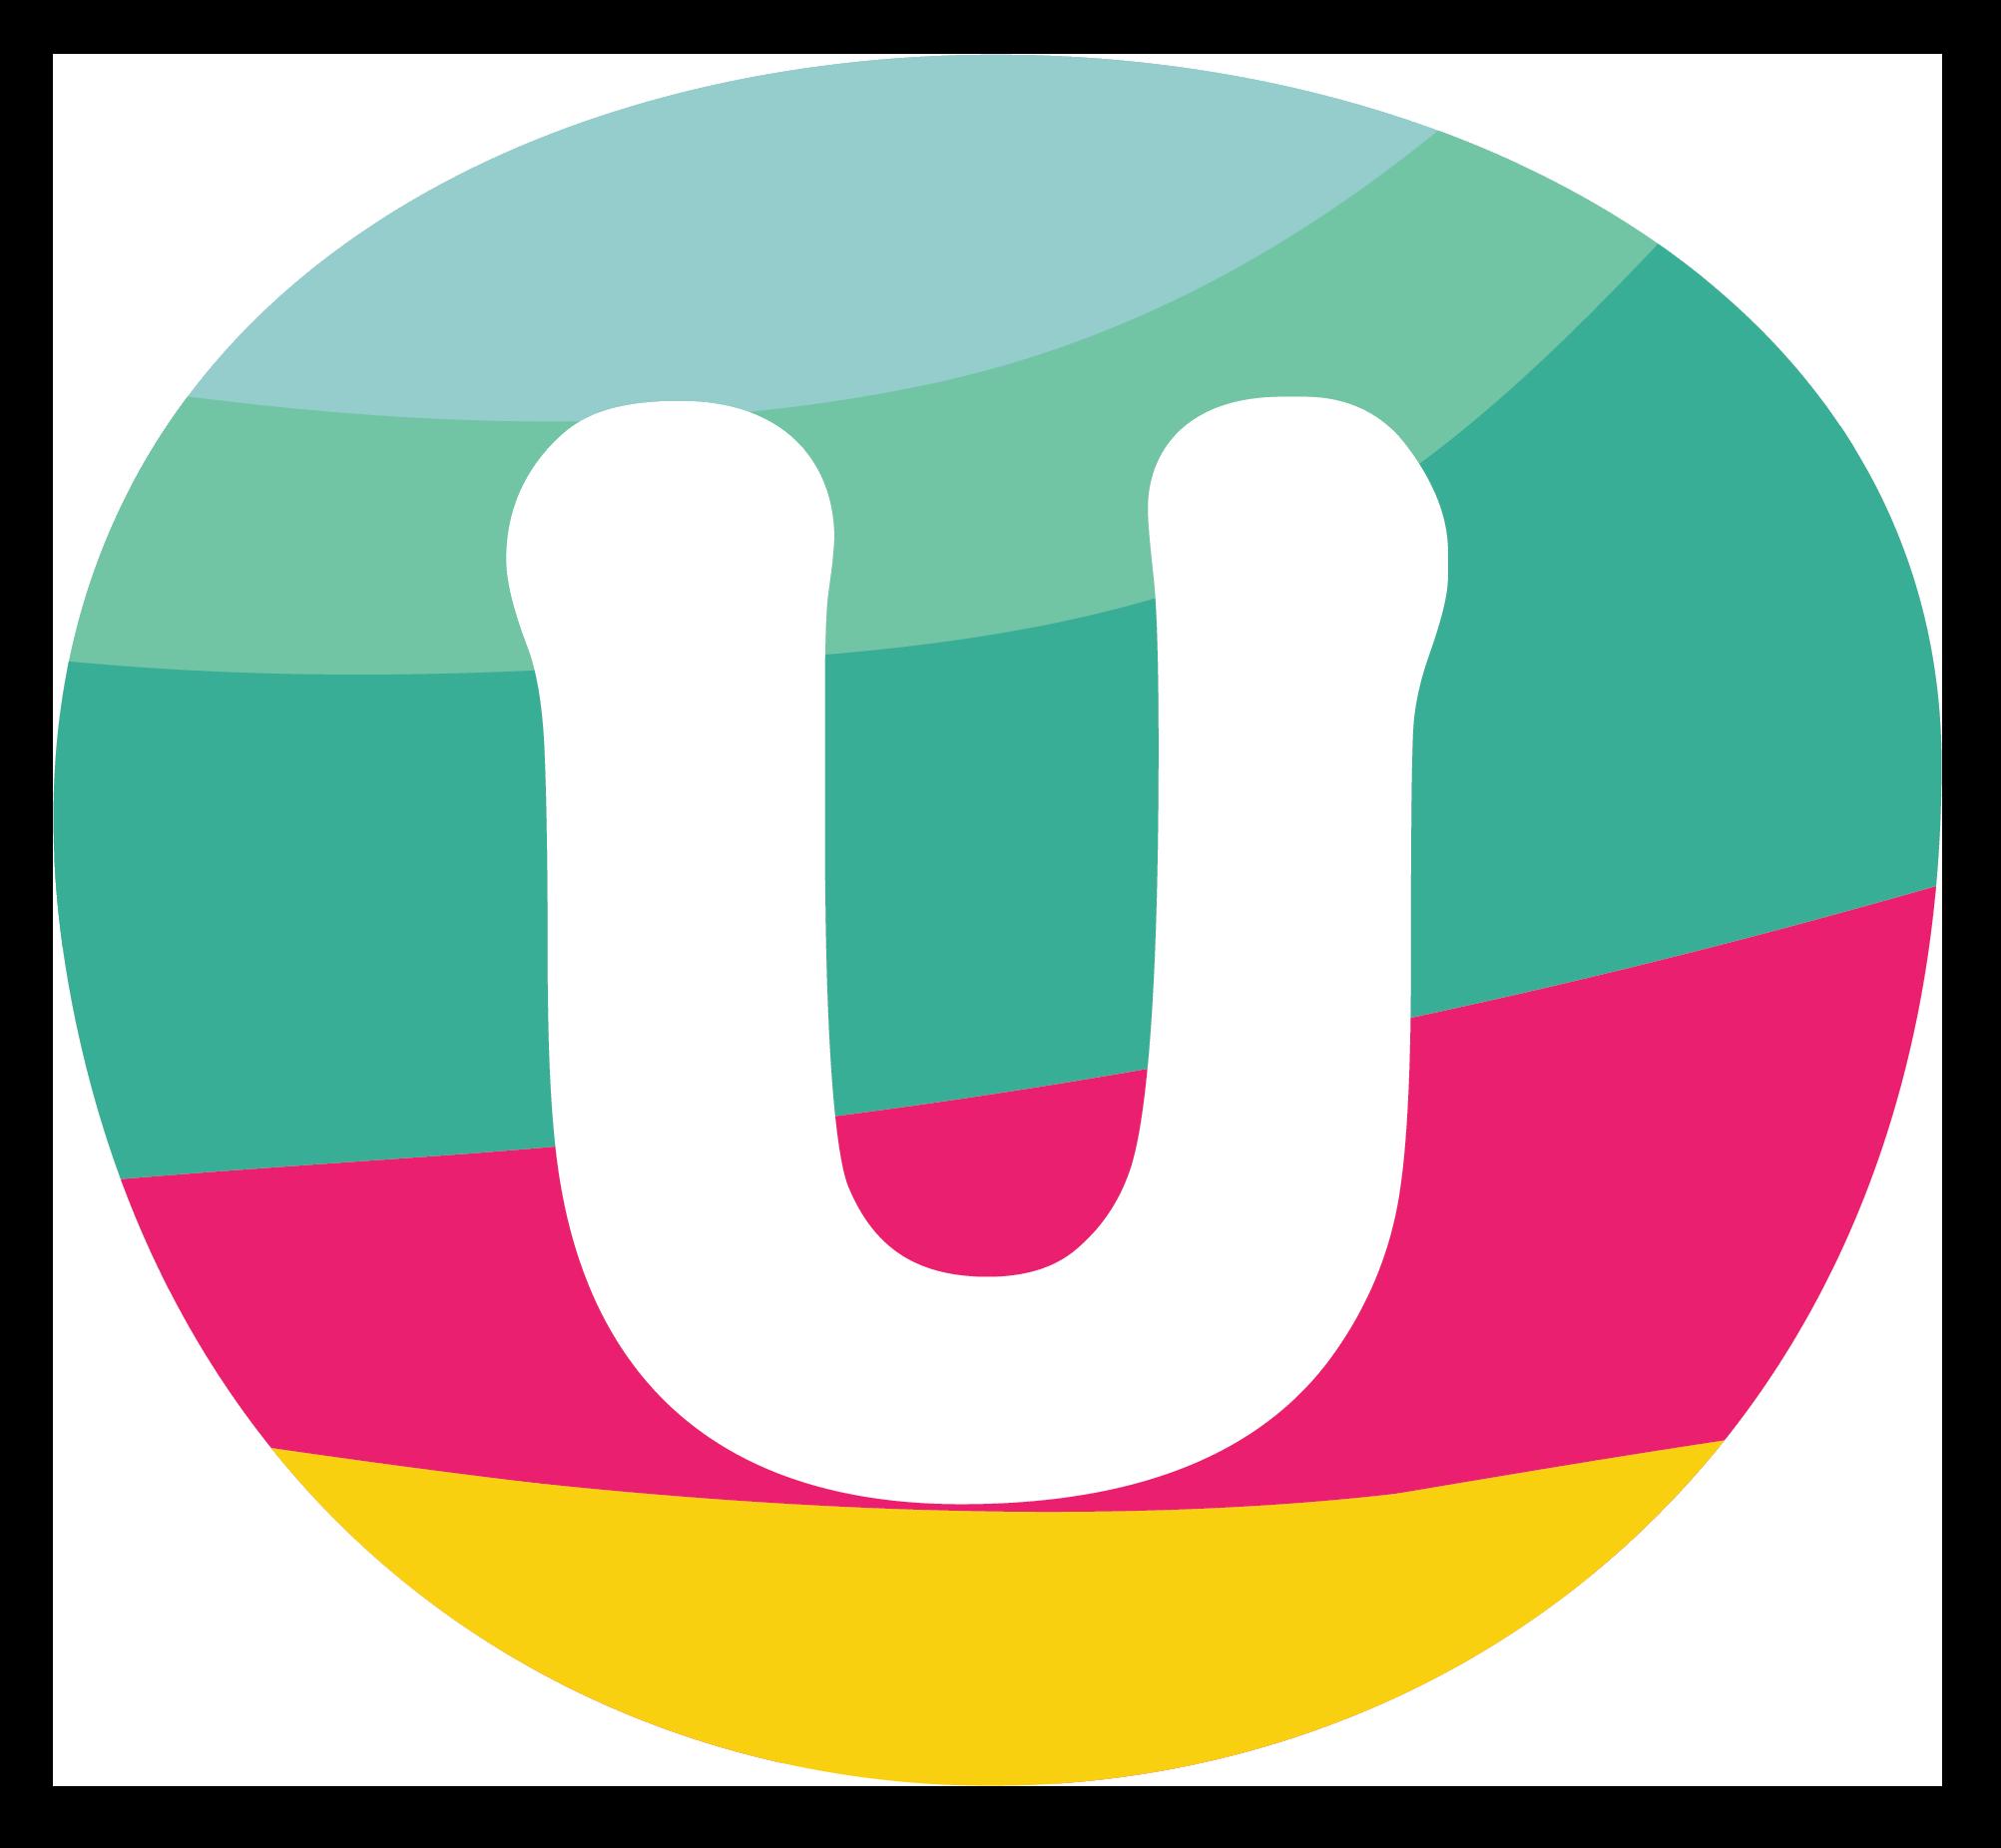 Unique-LOGO-ONLY-CMYK.png